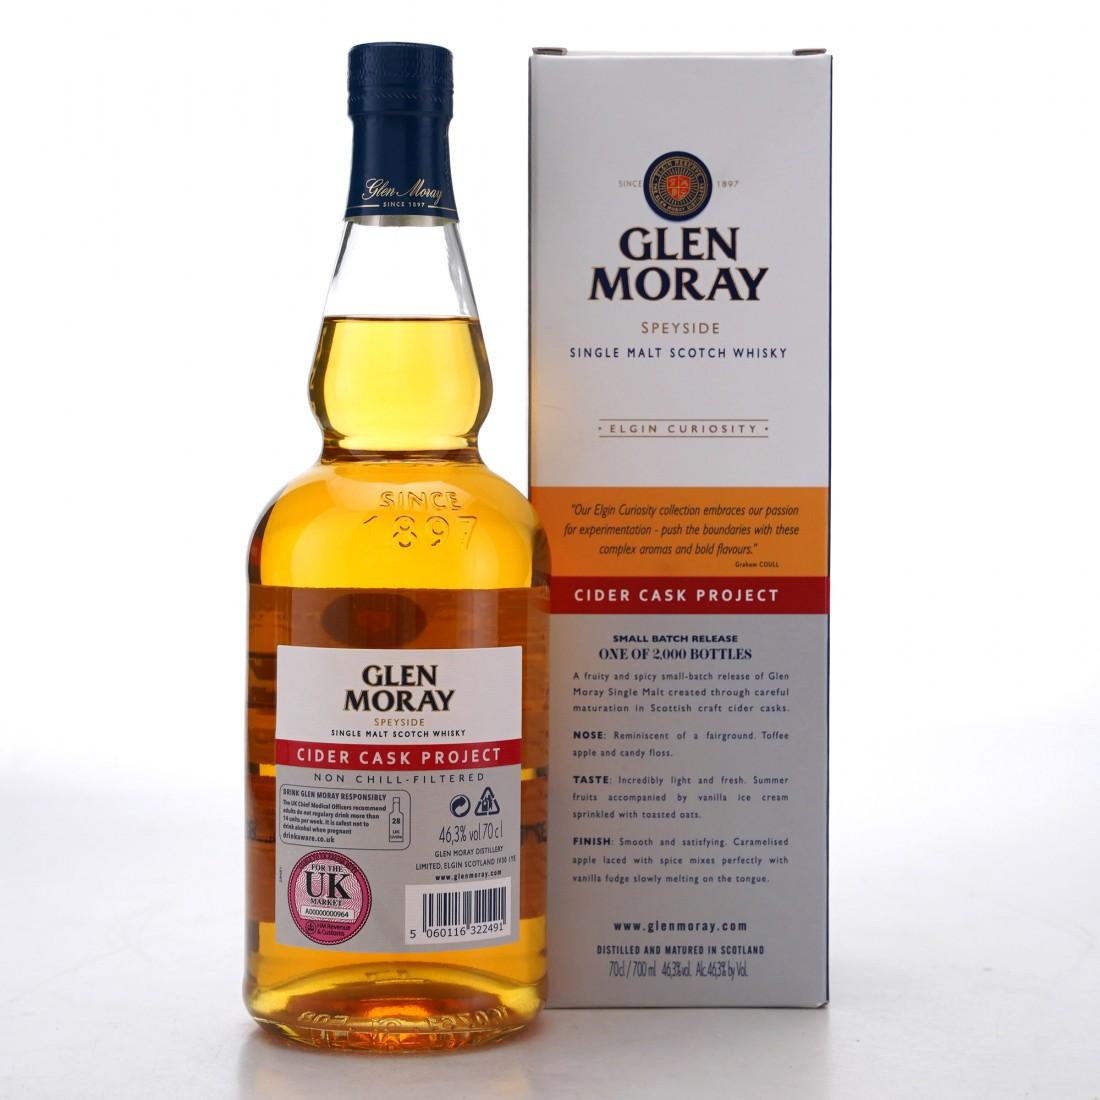 Glen Moray Cider Cask Project / UK